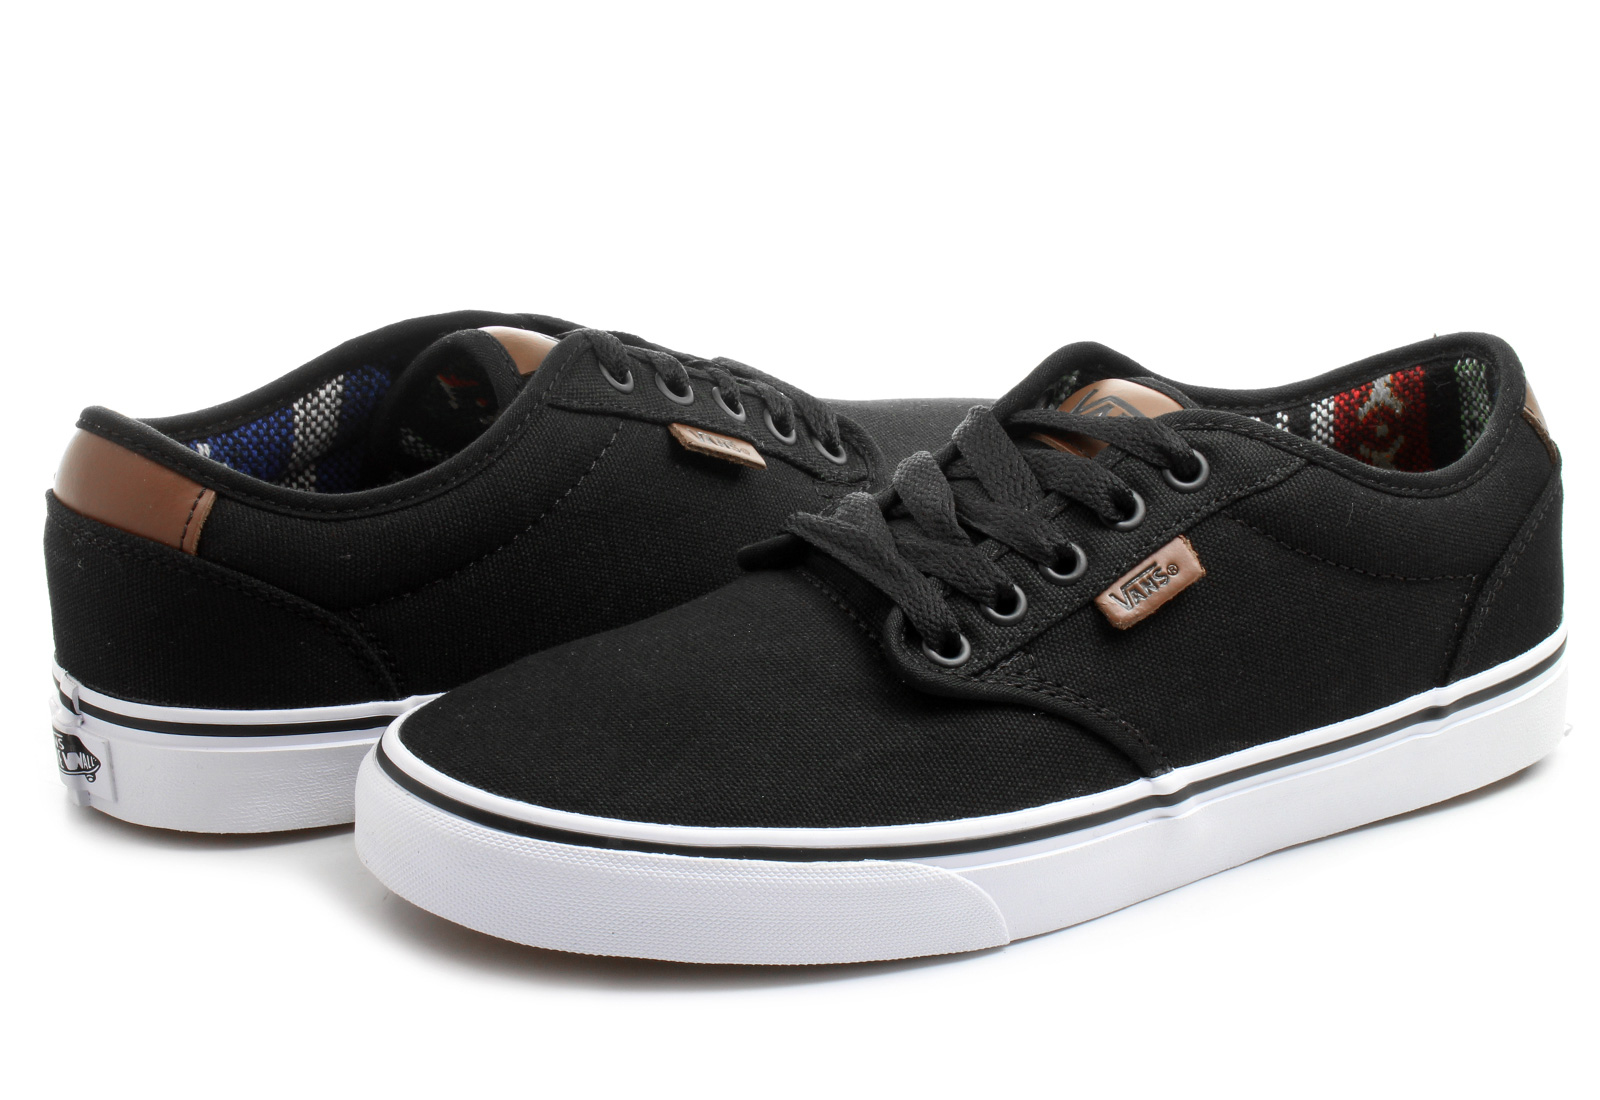 Vans Black Atwood Shoes